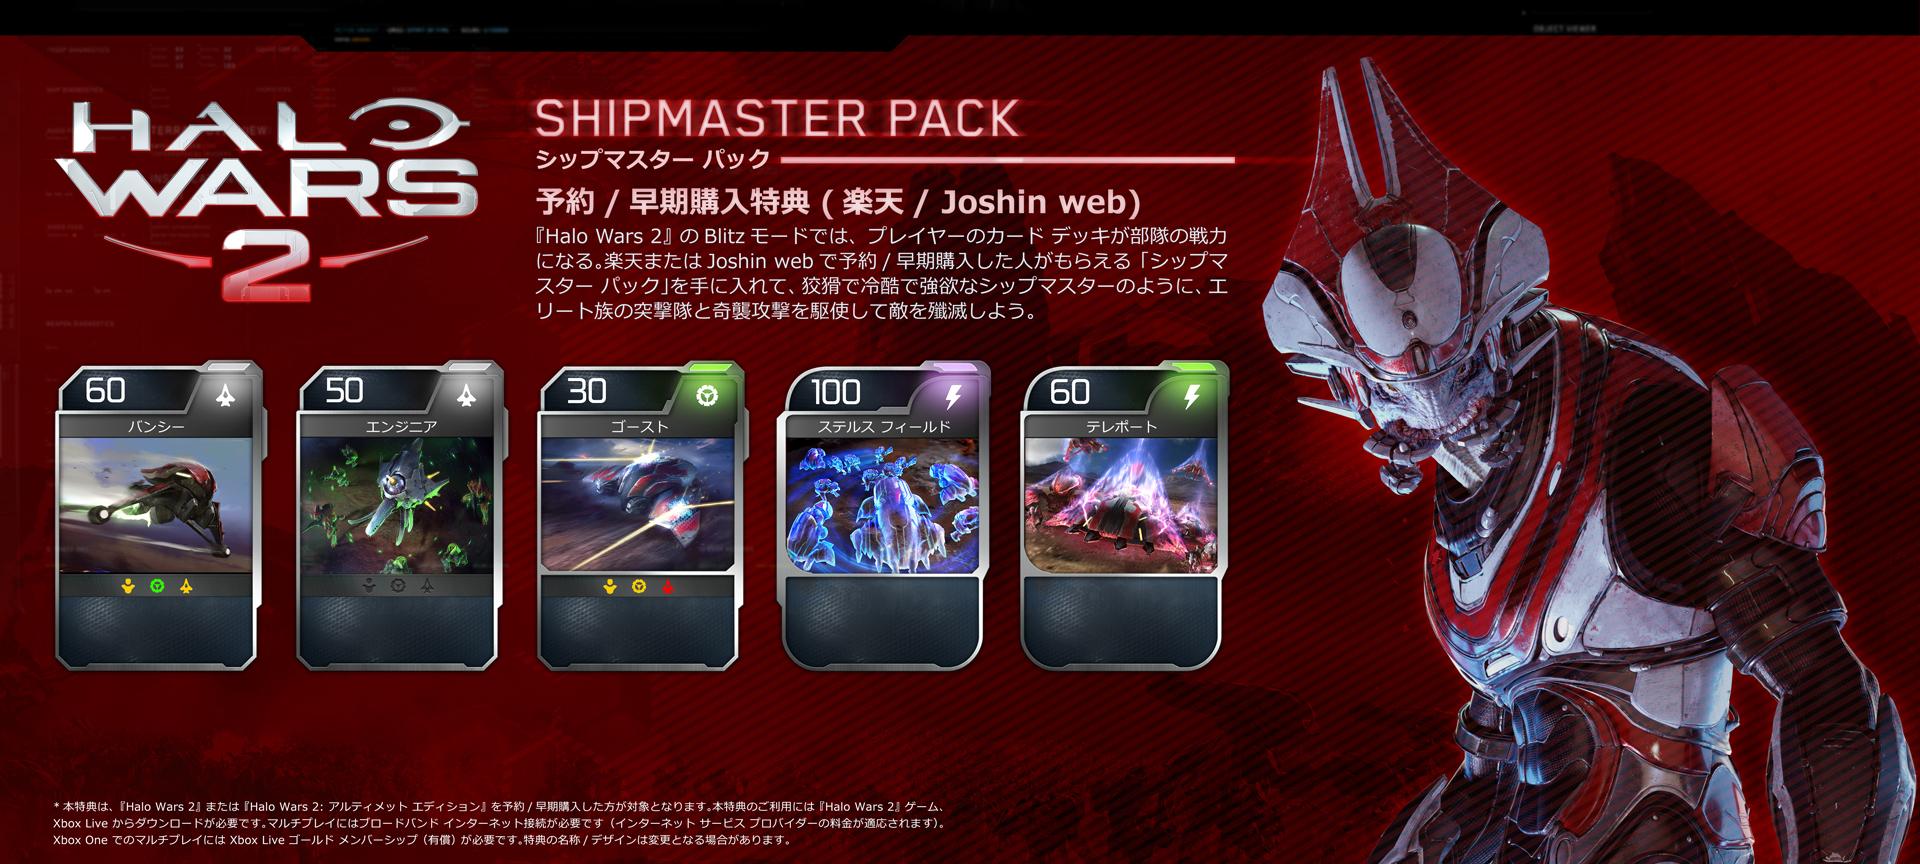 HaloWars2_PreOrder_ShipmasterPack_Rakuten_Joshin_noBB.jpg